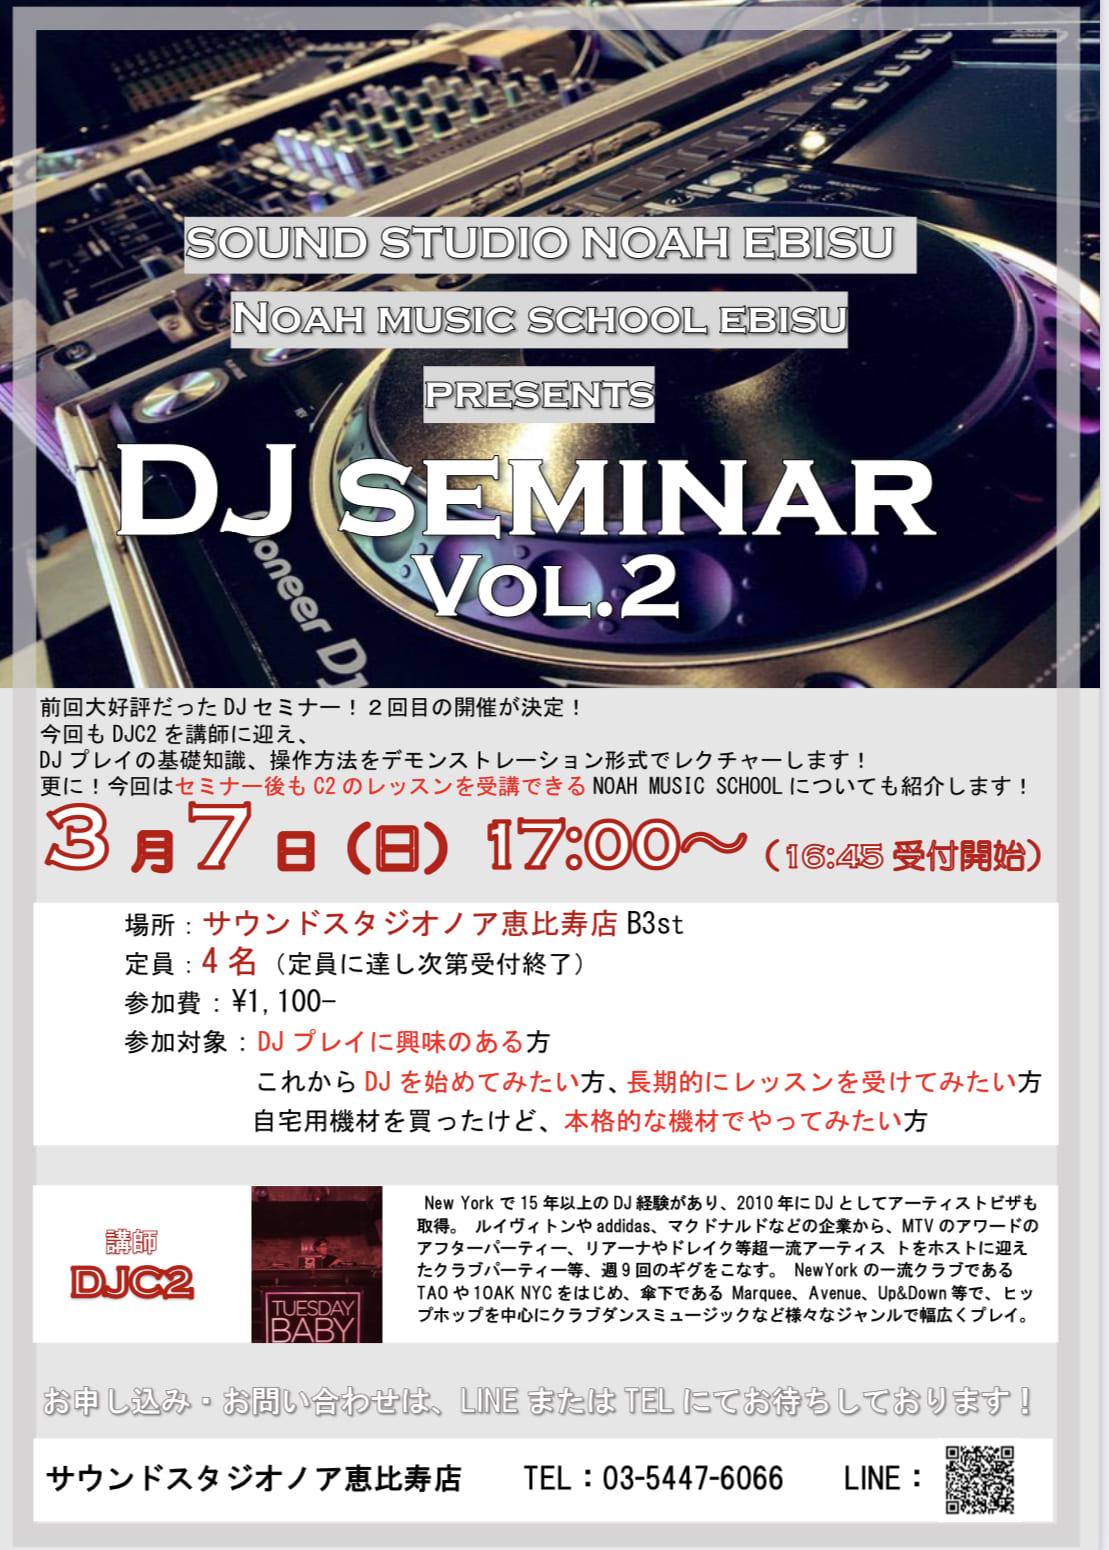 DJセミナーメルマガ用.jpg